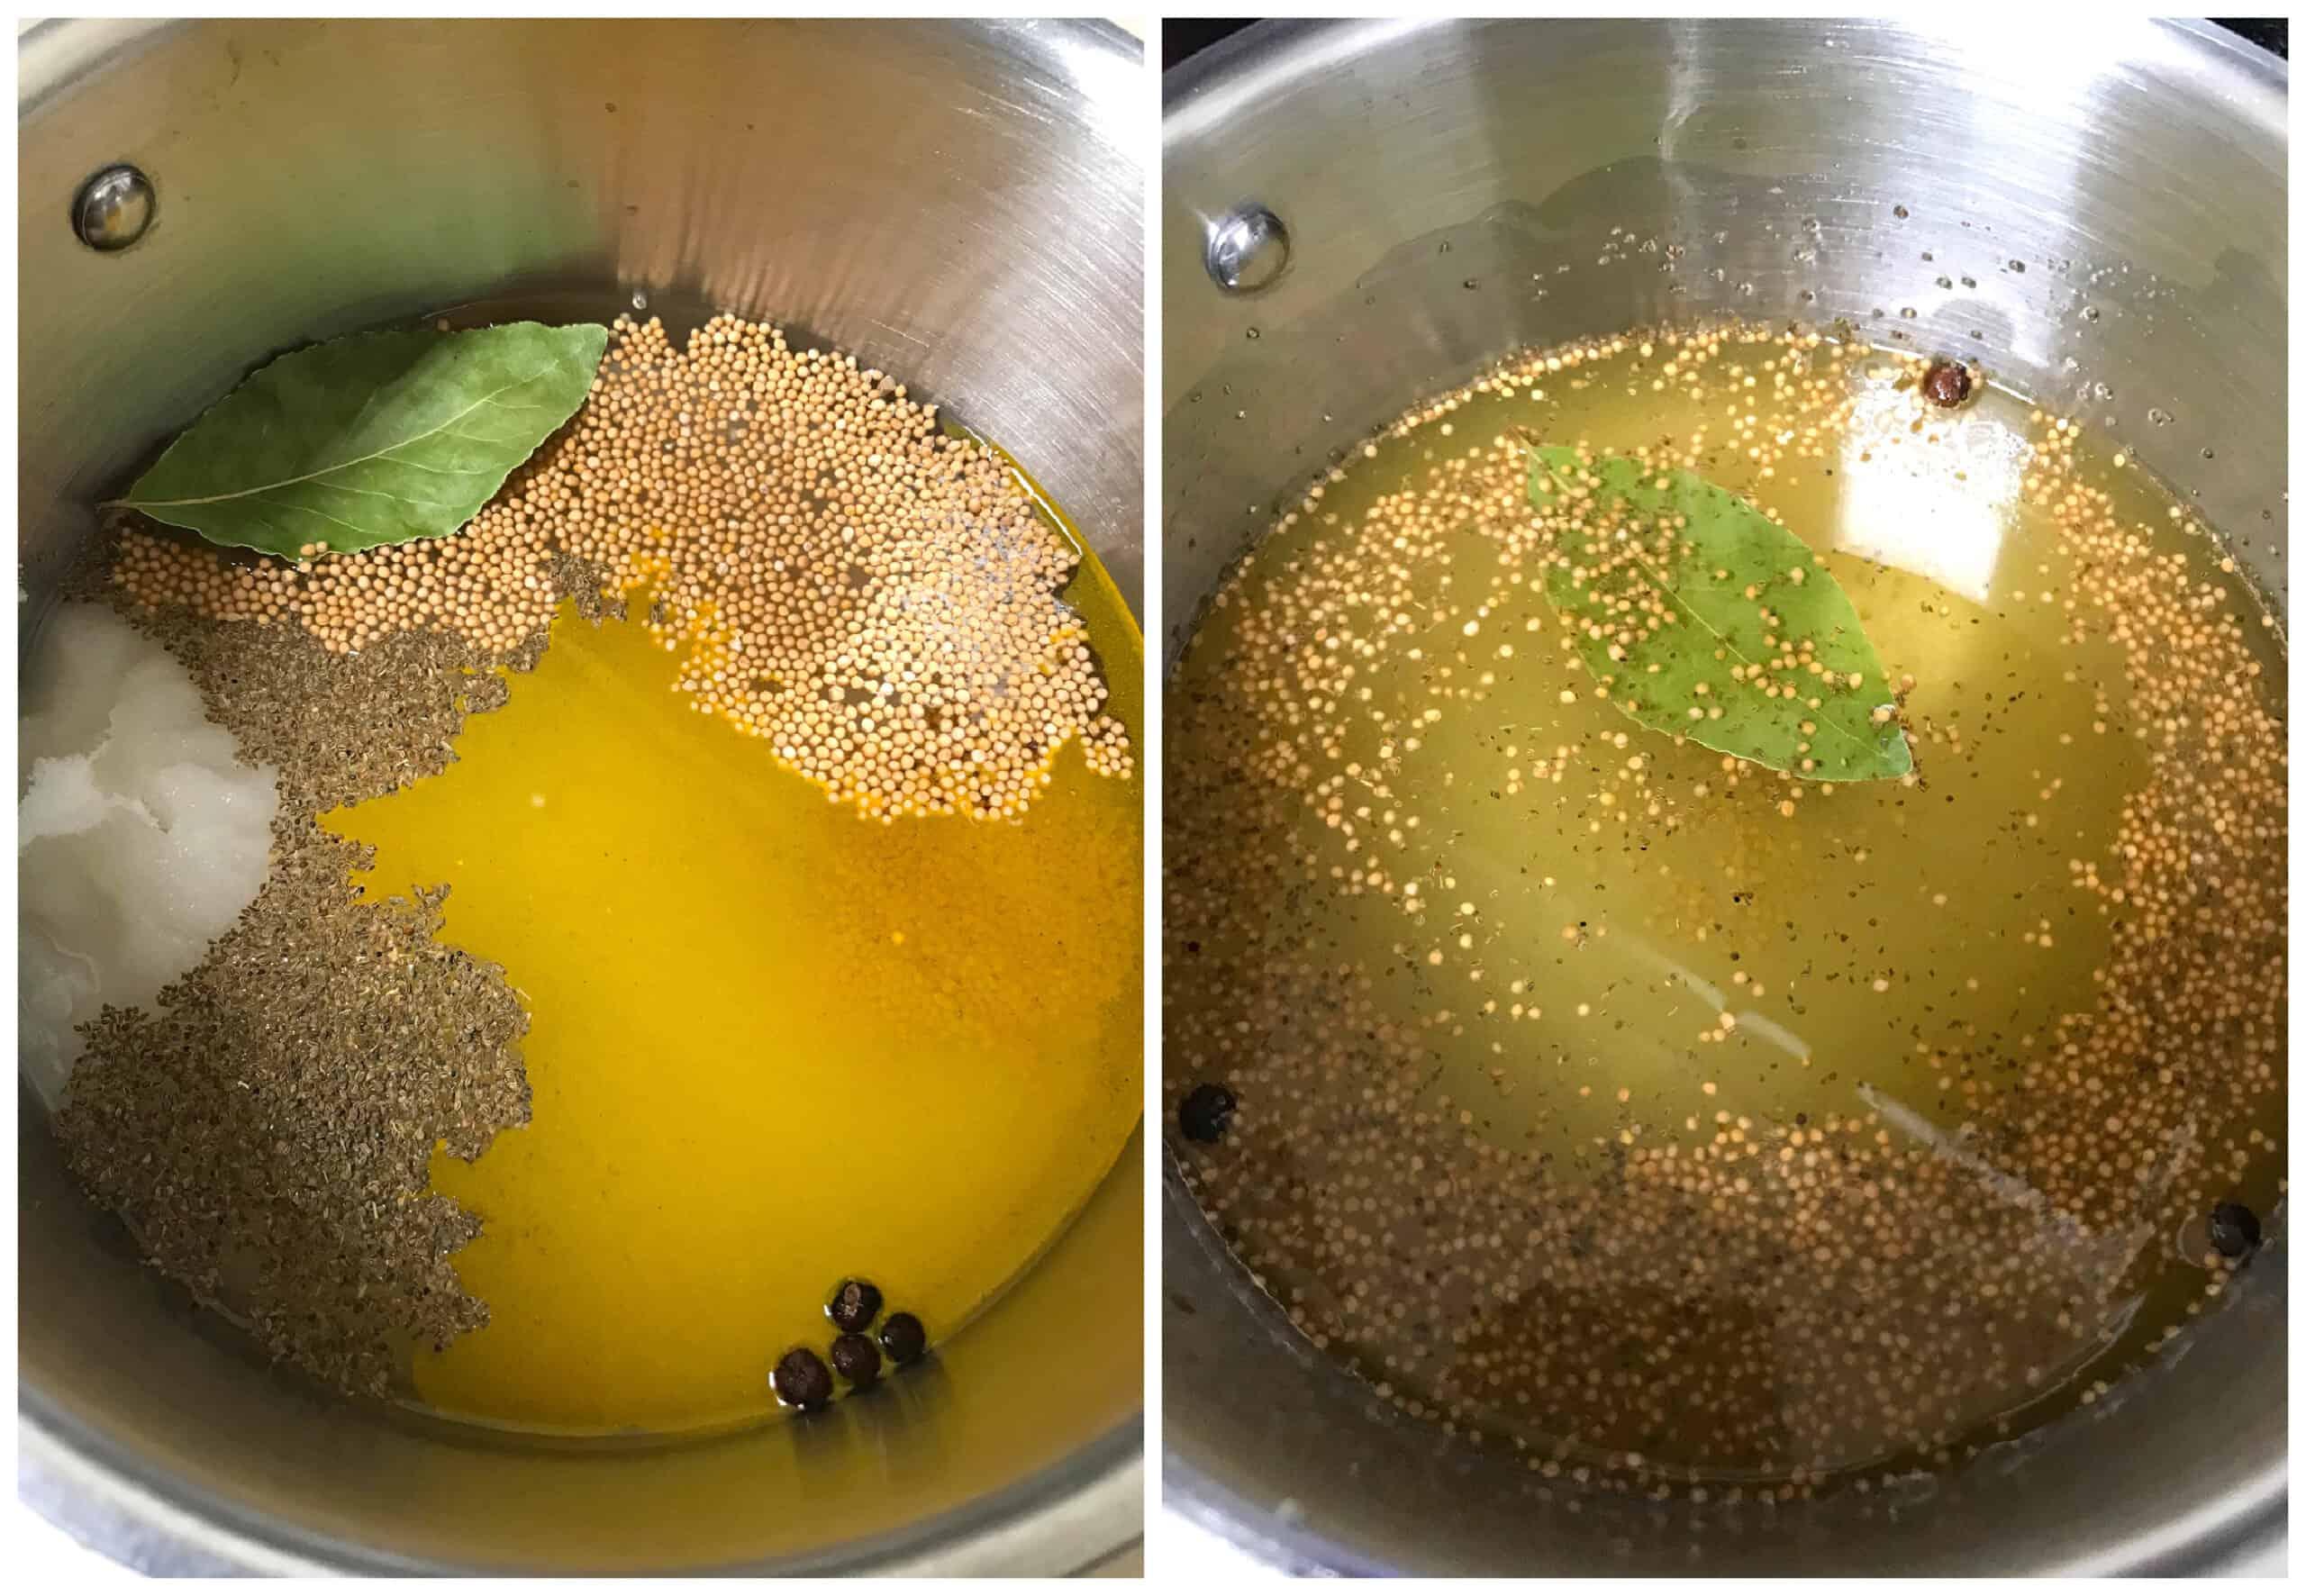 making pickling brine